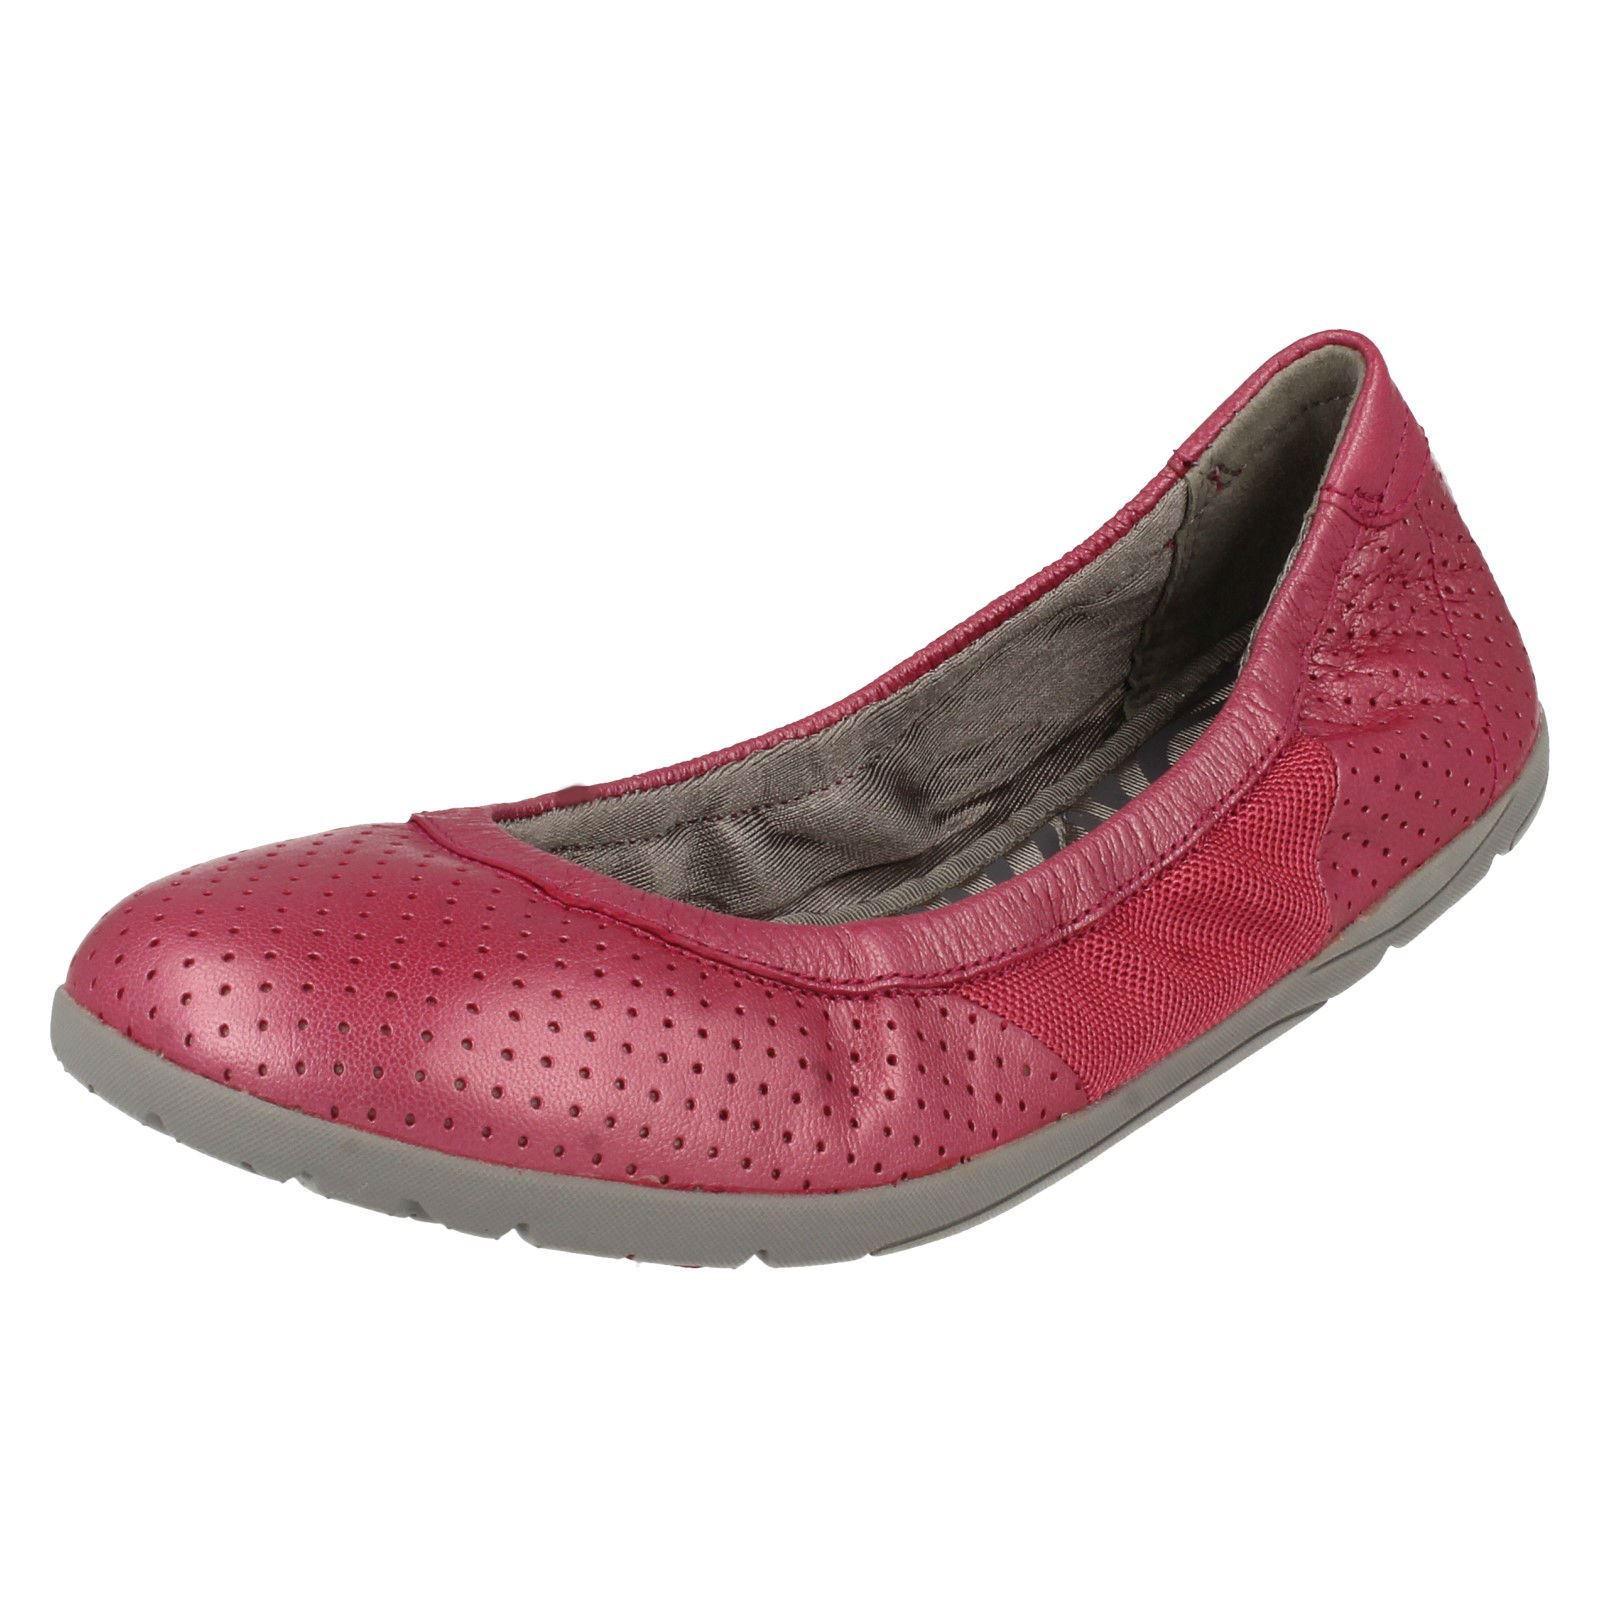 ee70b403adb Ladies Clarks Slip On Ballet Pumps  Illya Shine